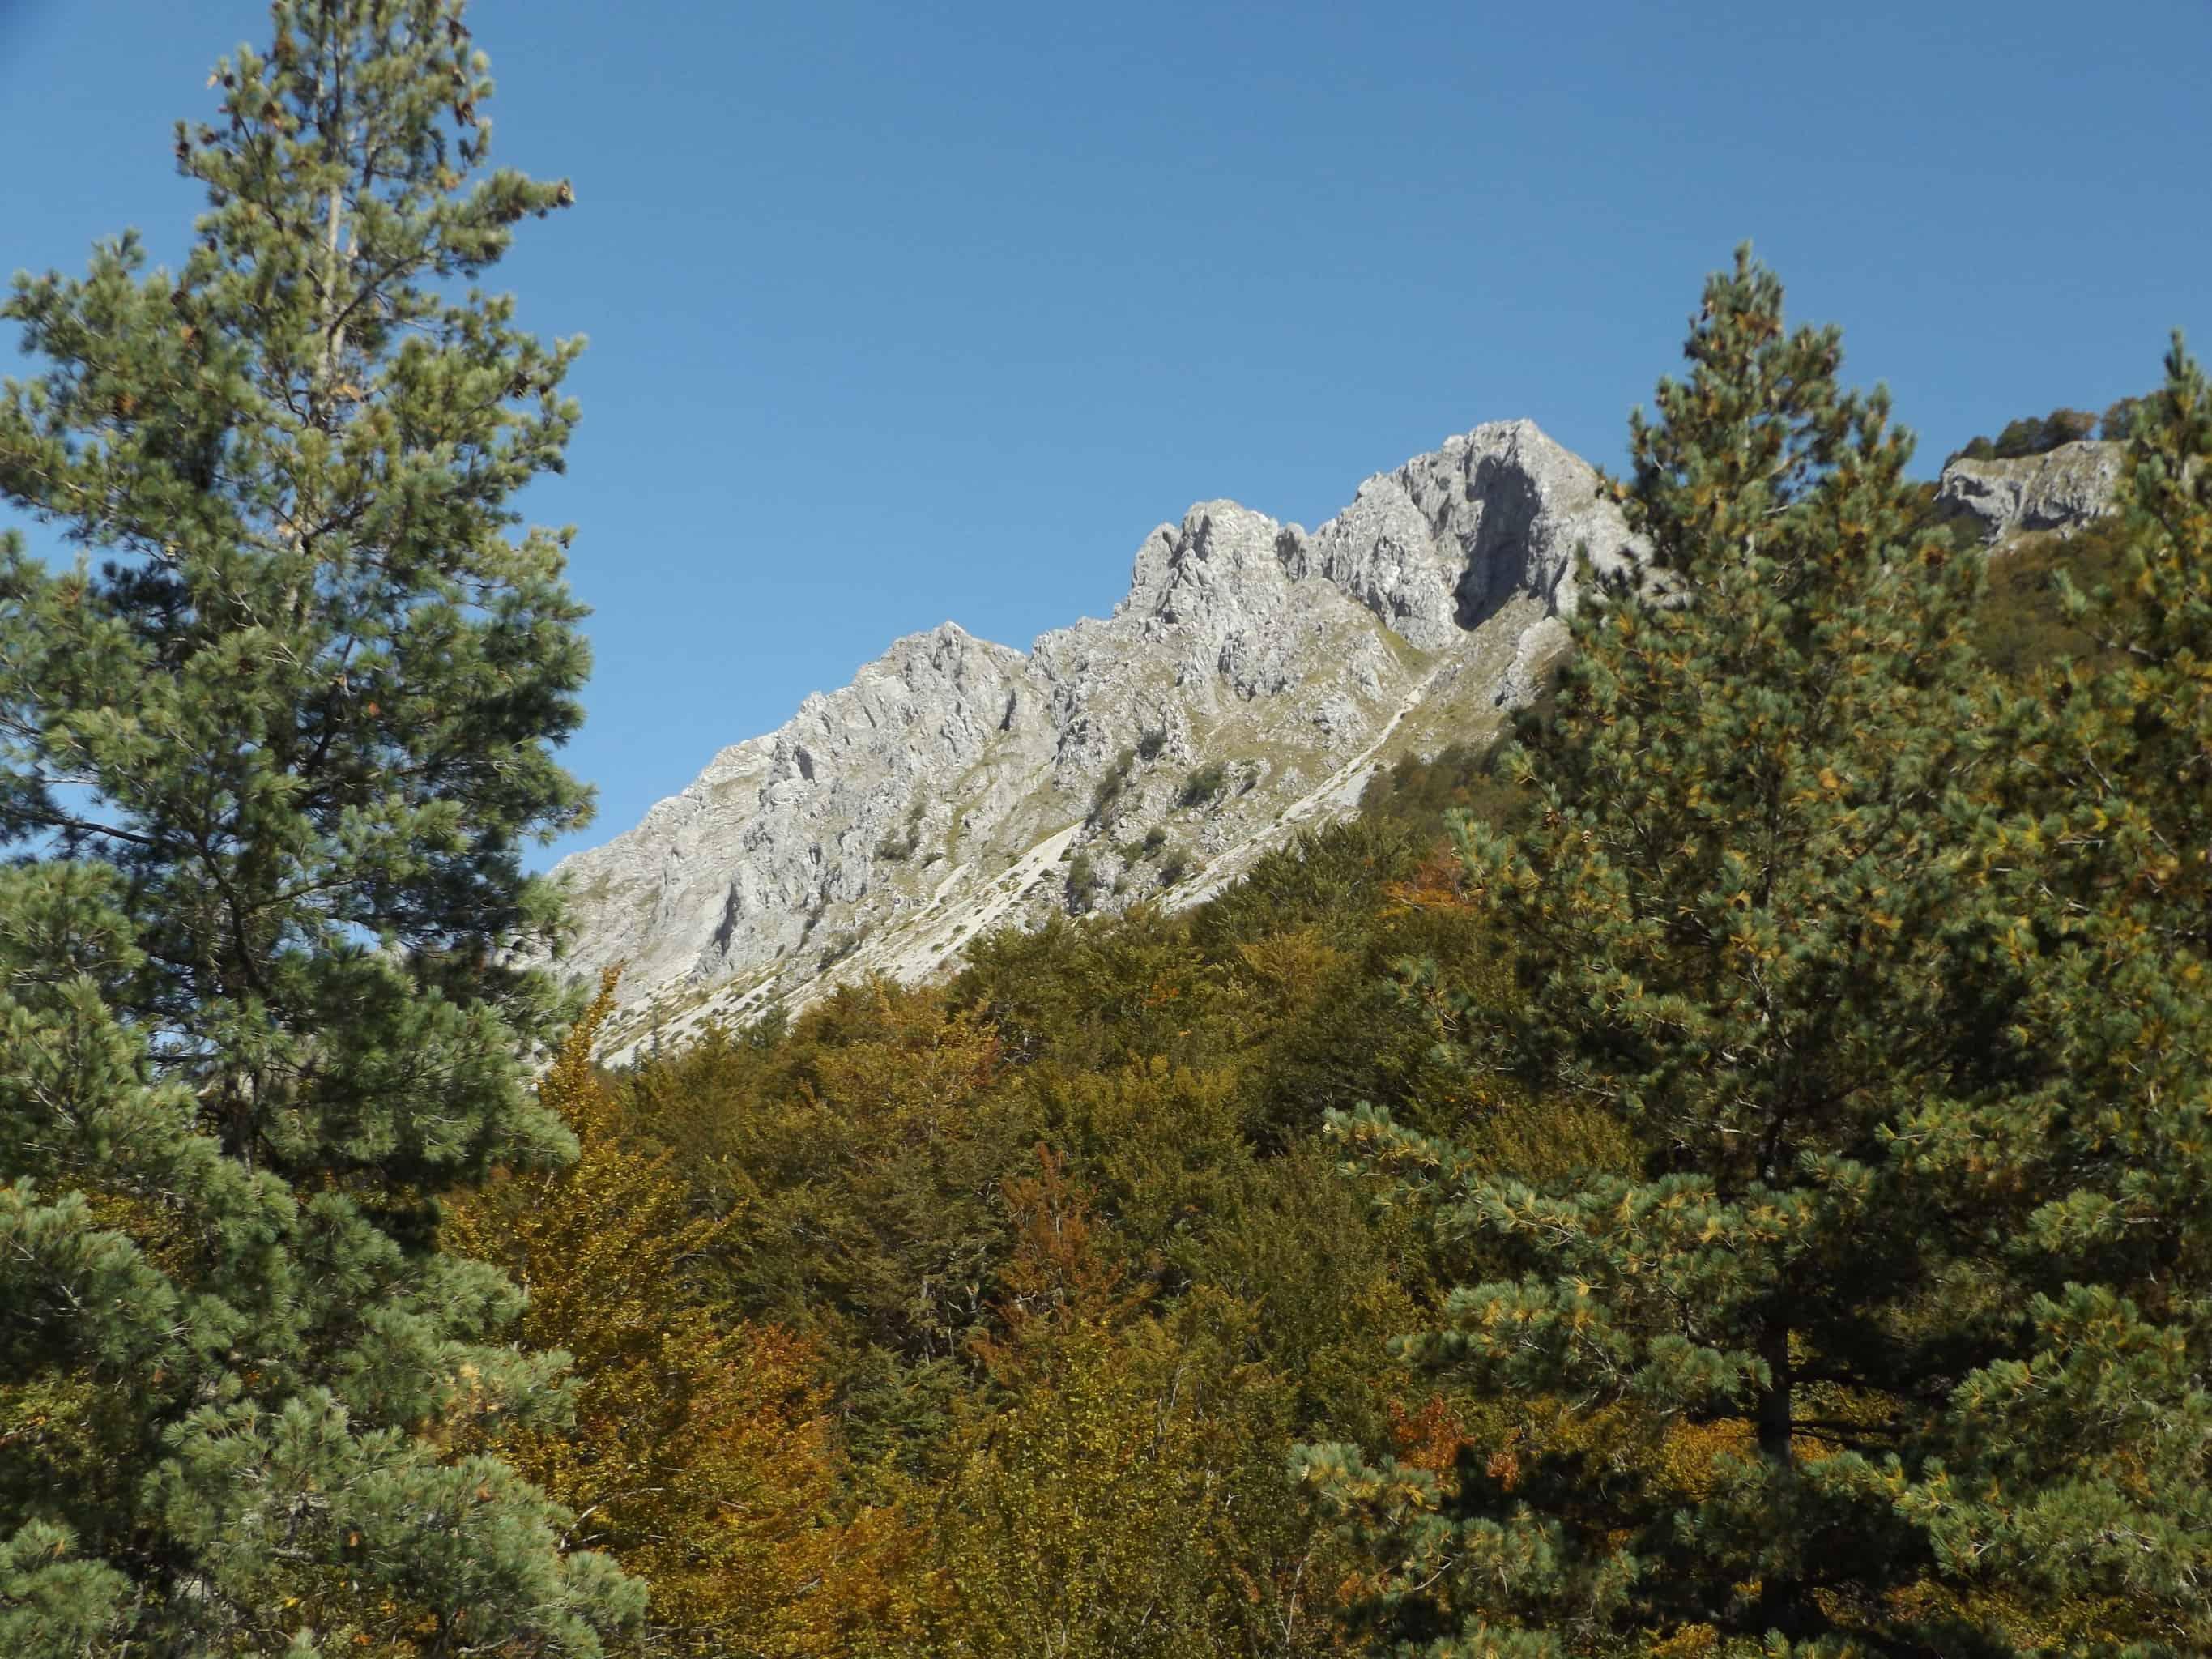 UNESCO-Weltnaturerbe Buchenwälder | Foto: Shebenik-Jabllanicë Nationalpark